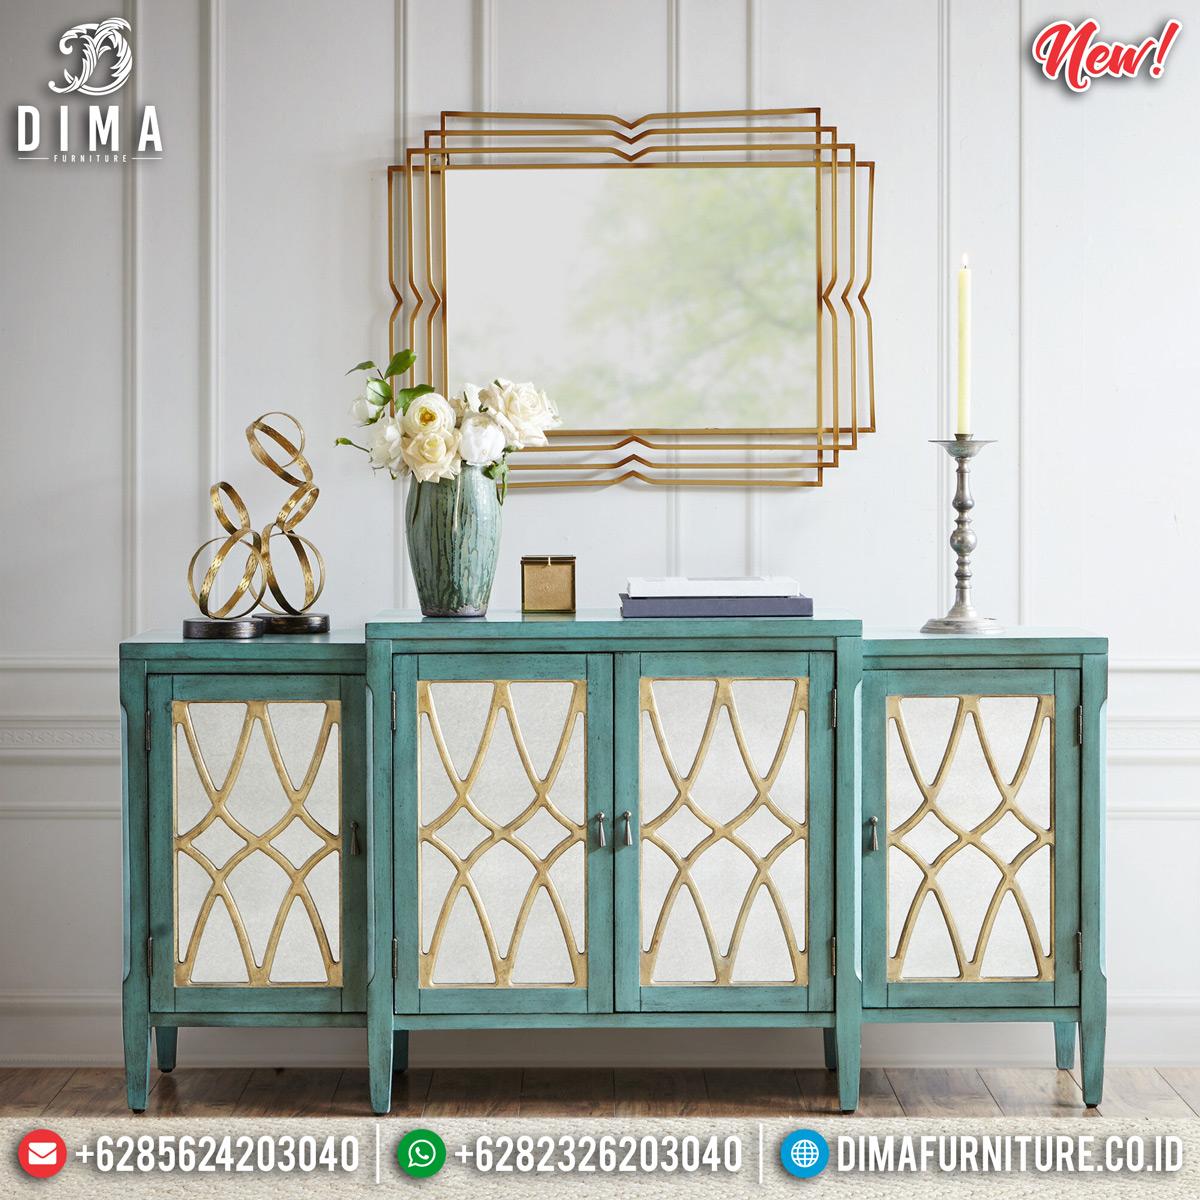 Harga Meja Konsol Modern Minimalis Luxury Style Crystal Glass Set MMJ-0775